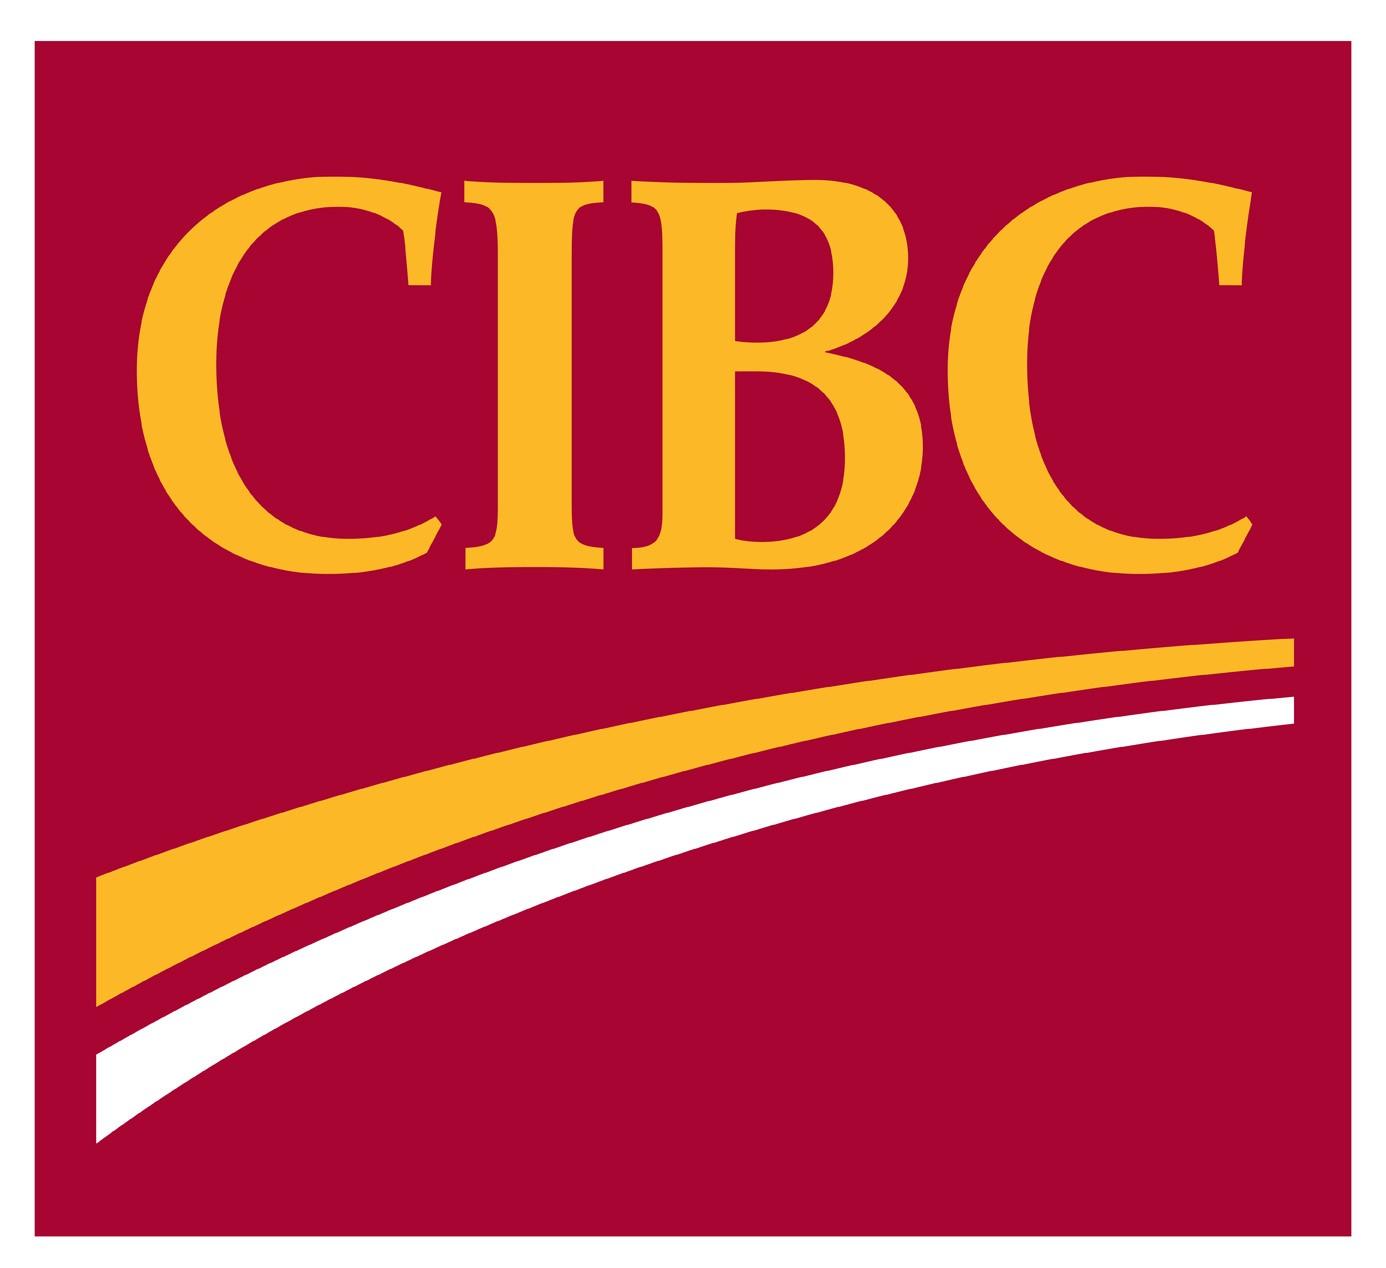 CIBC logo - Business in Manotick